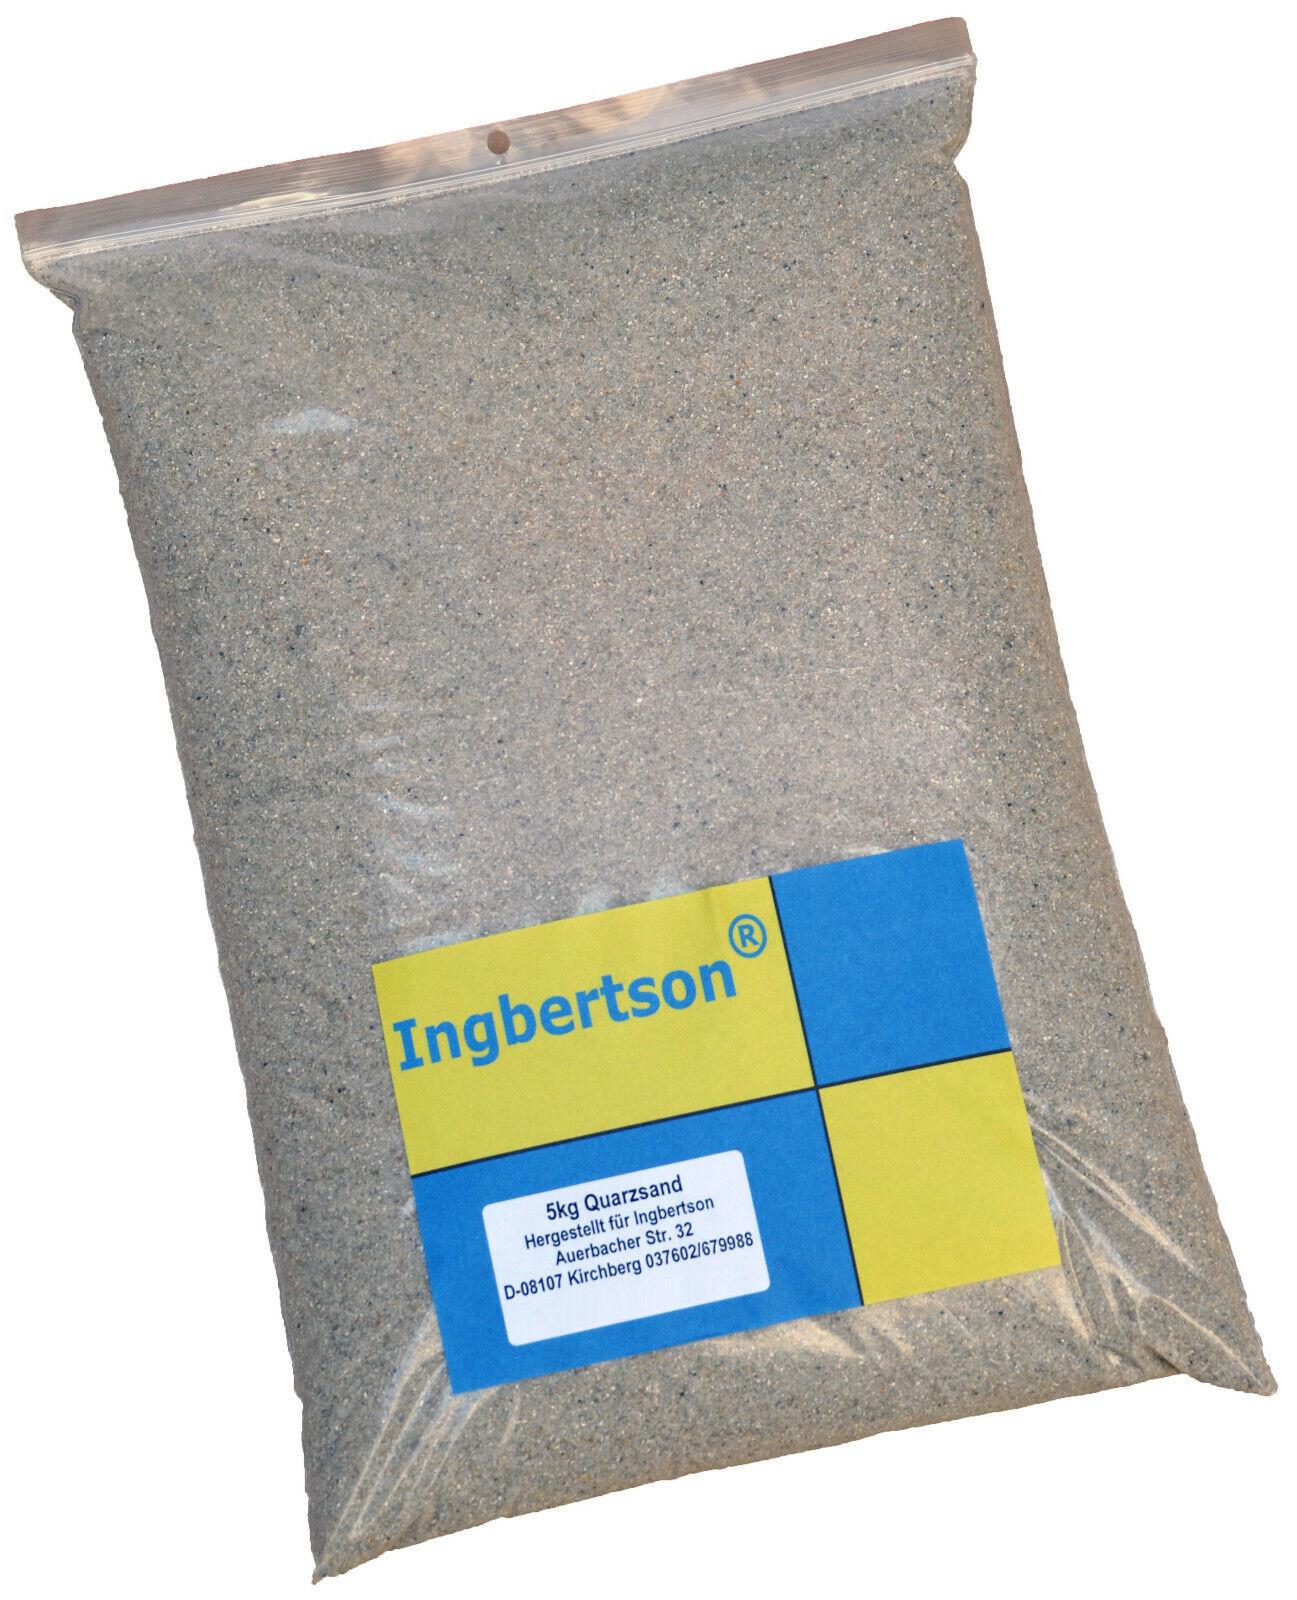 (EUR 2,80/kg) 5kg Ingbertson® Quarzsand 1 bis 1,6 mm Sand Filtersand Filterkies